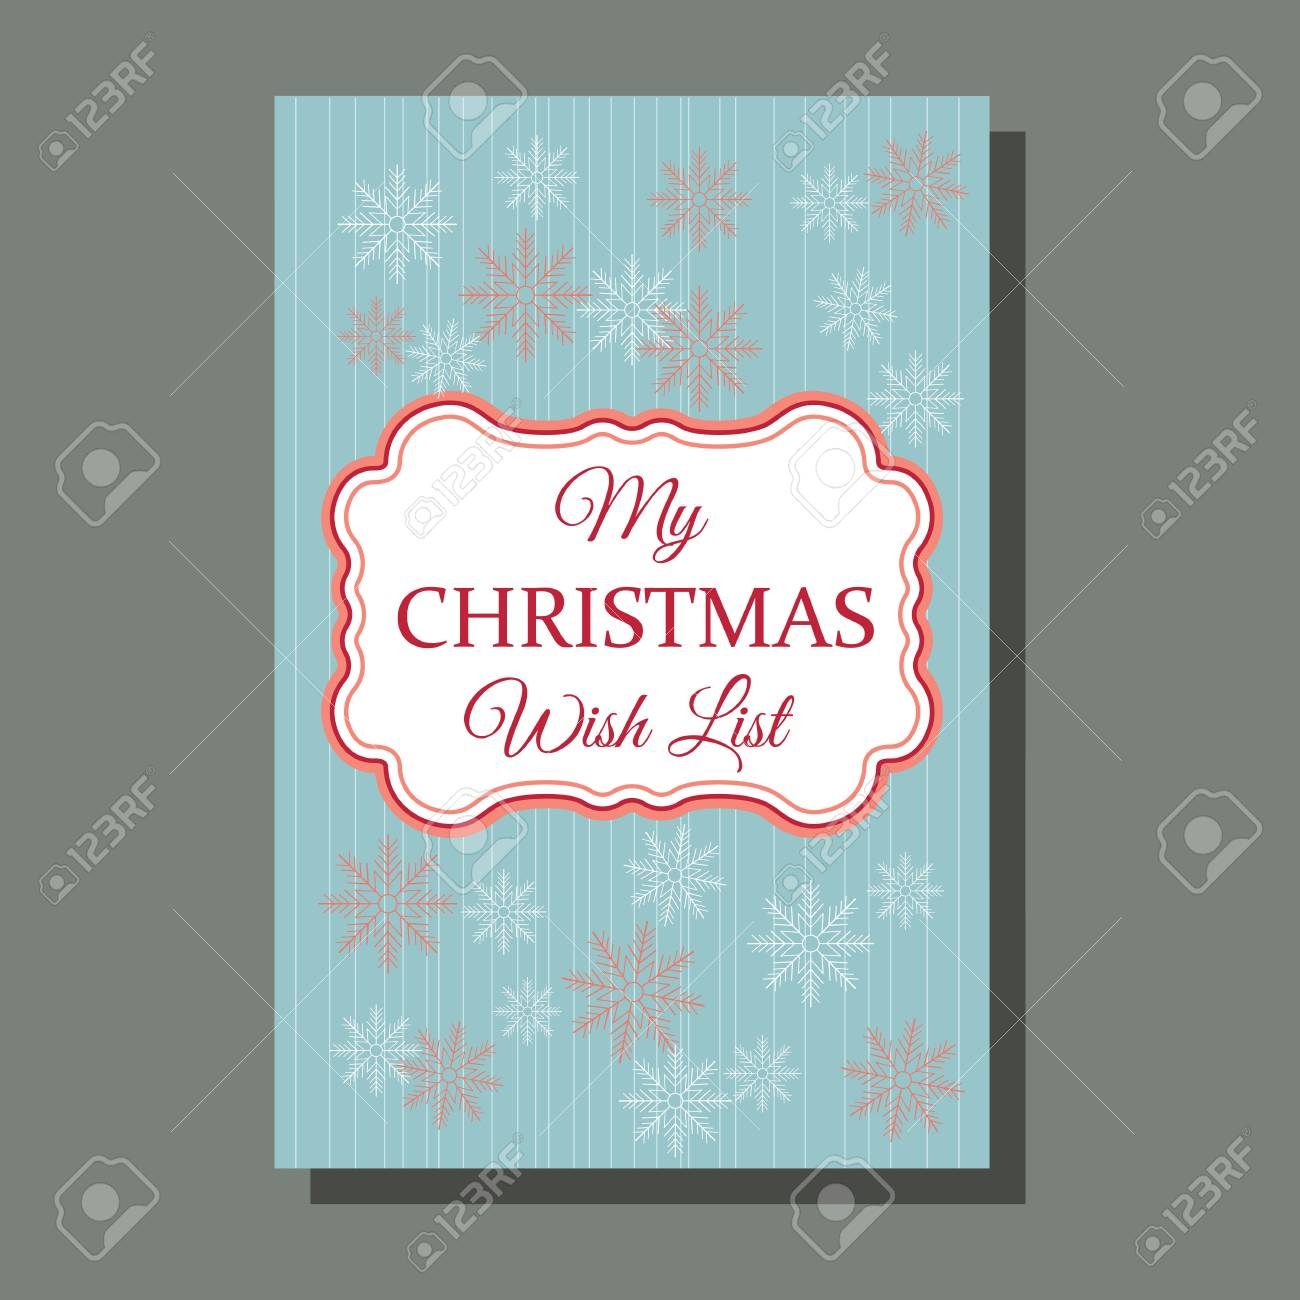 Christmas Card Greeting Idea.Christmas Card Holiday Season Greeting Concept My Wish List